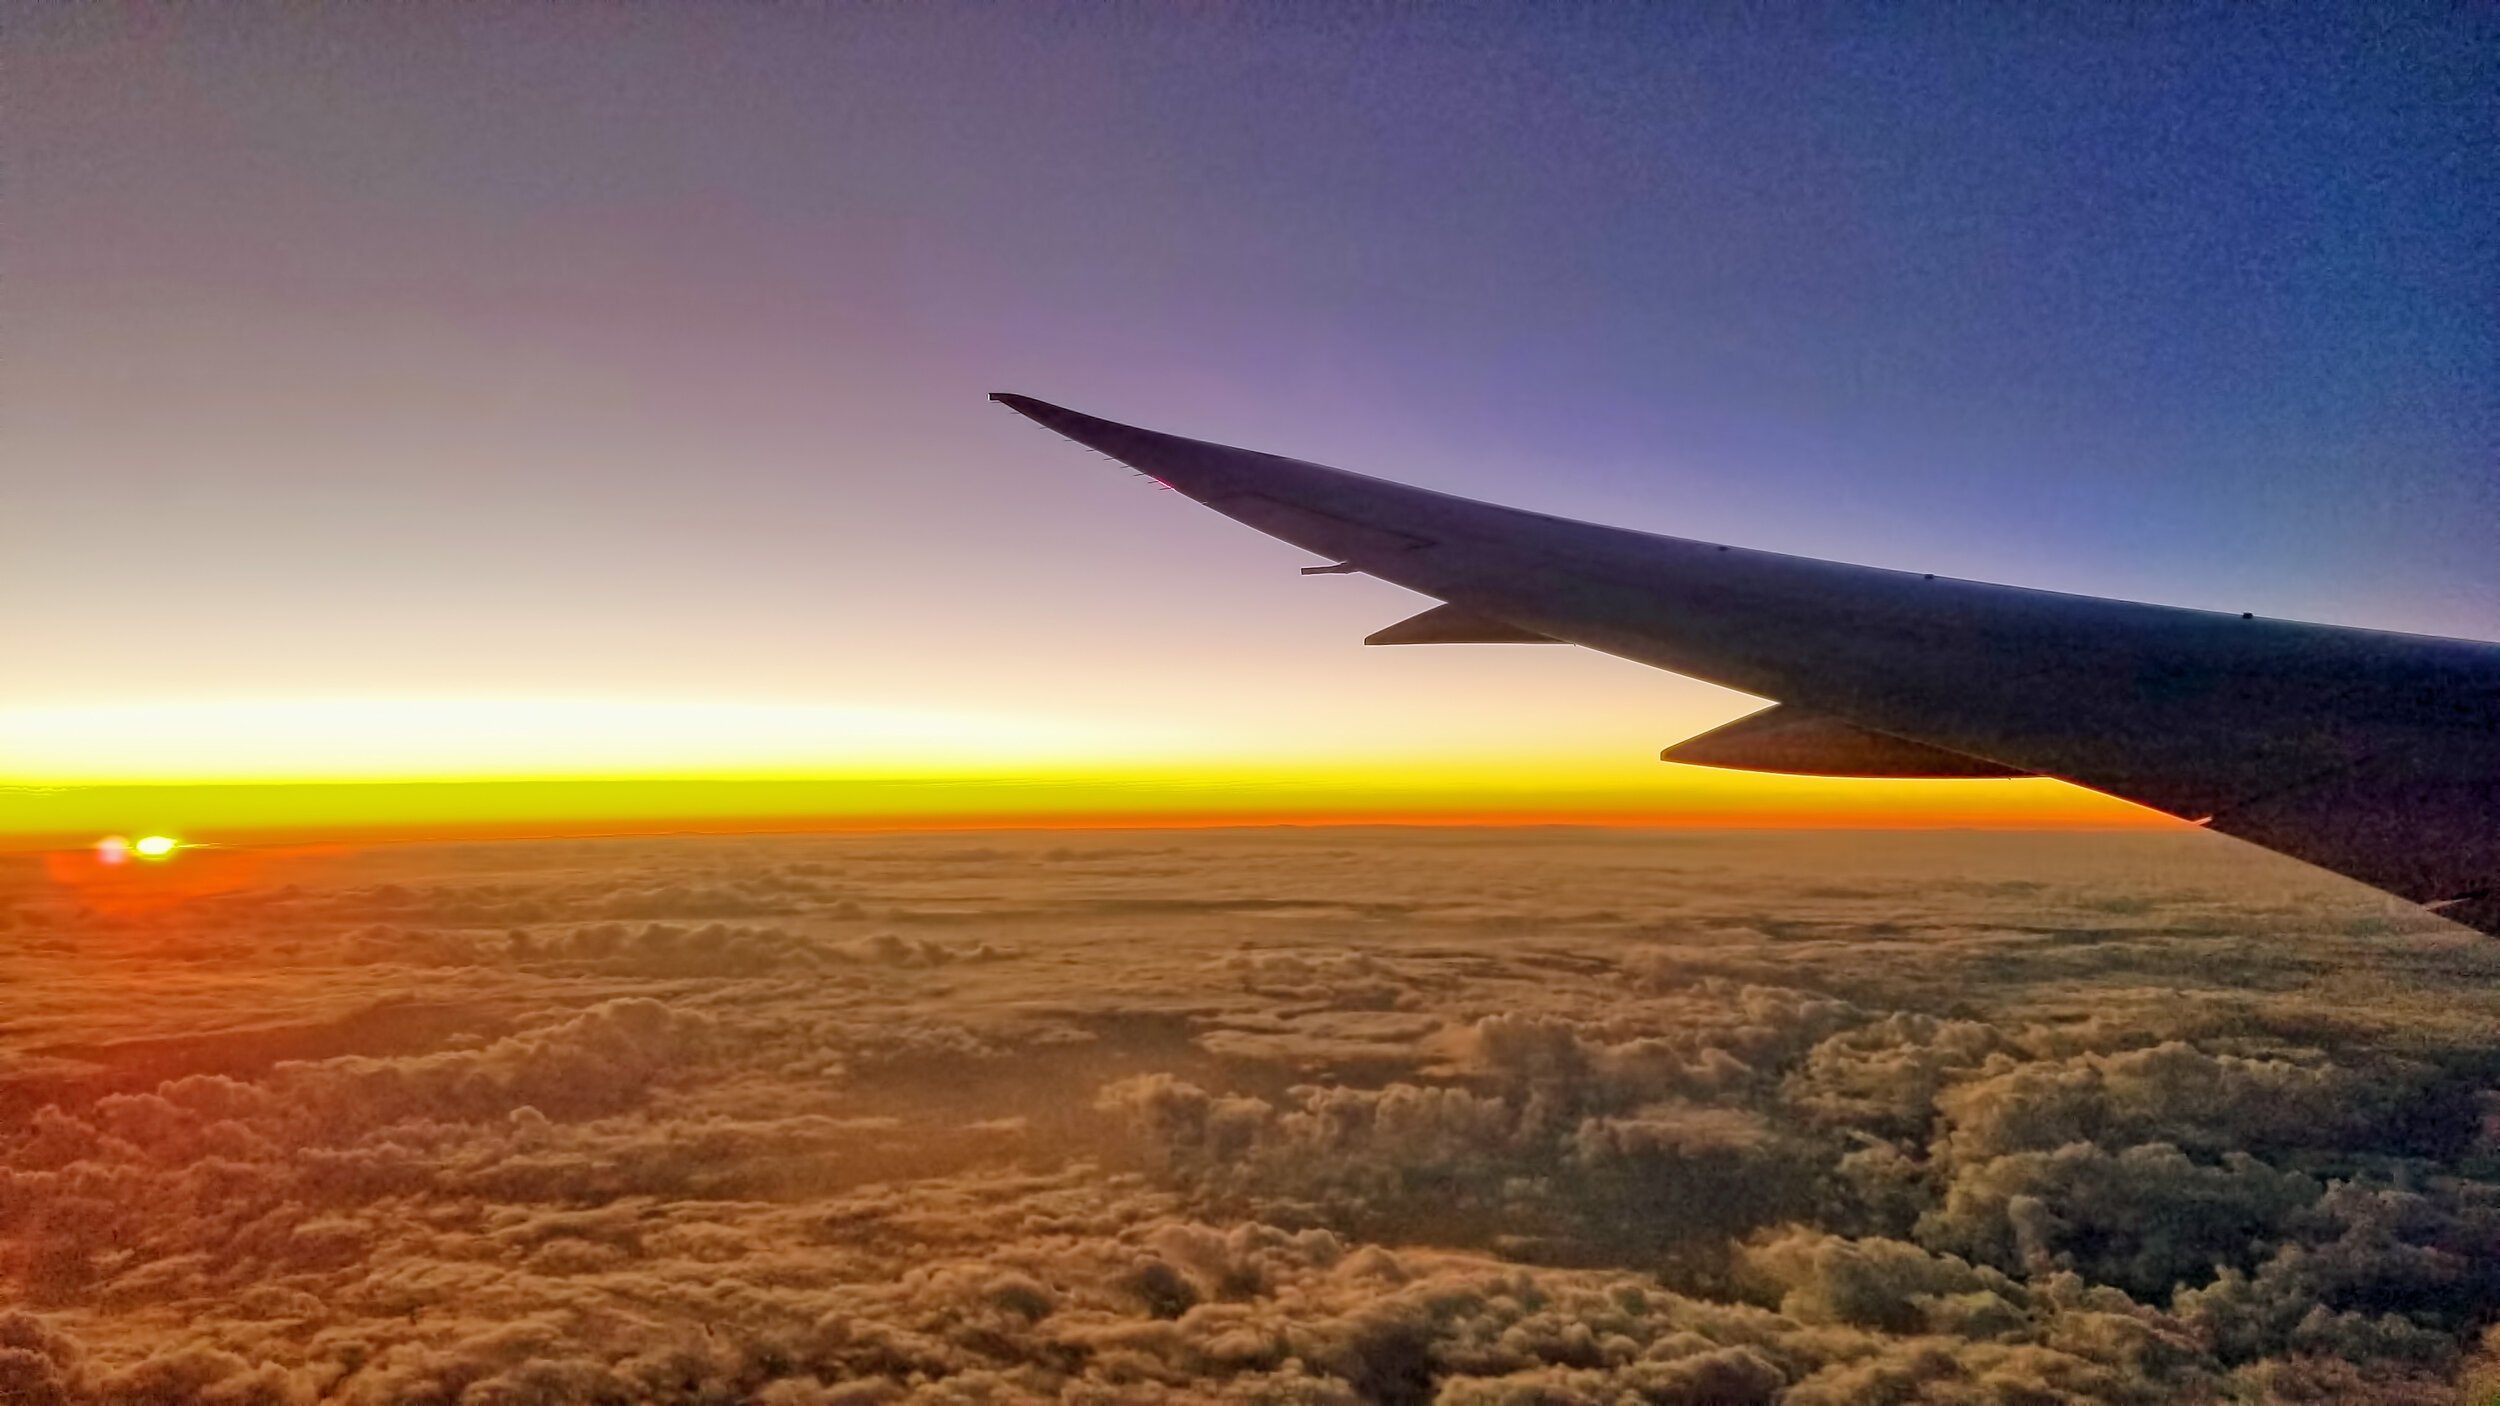 Sun rise across the International Date Line on approach to Brisbane, Australia.